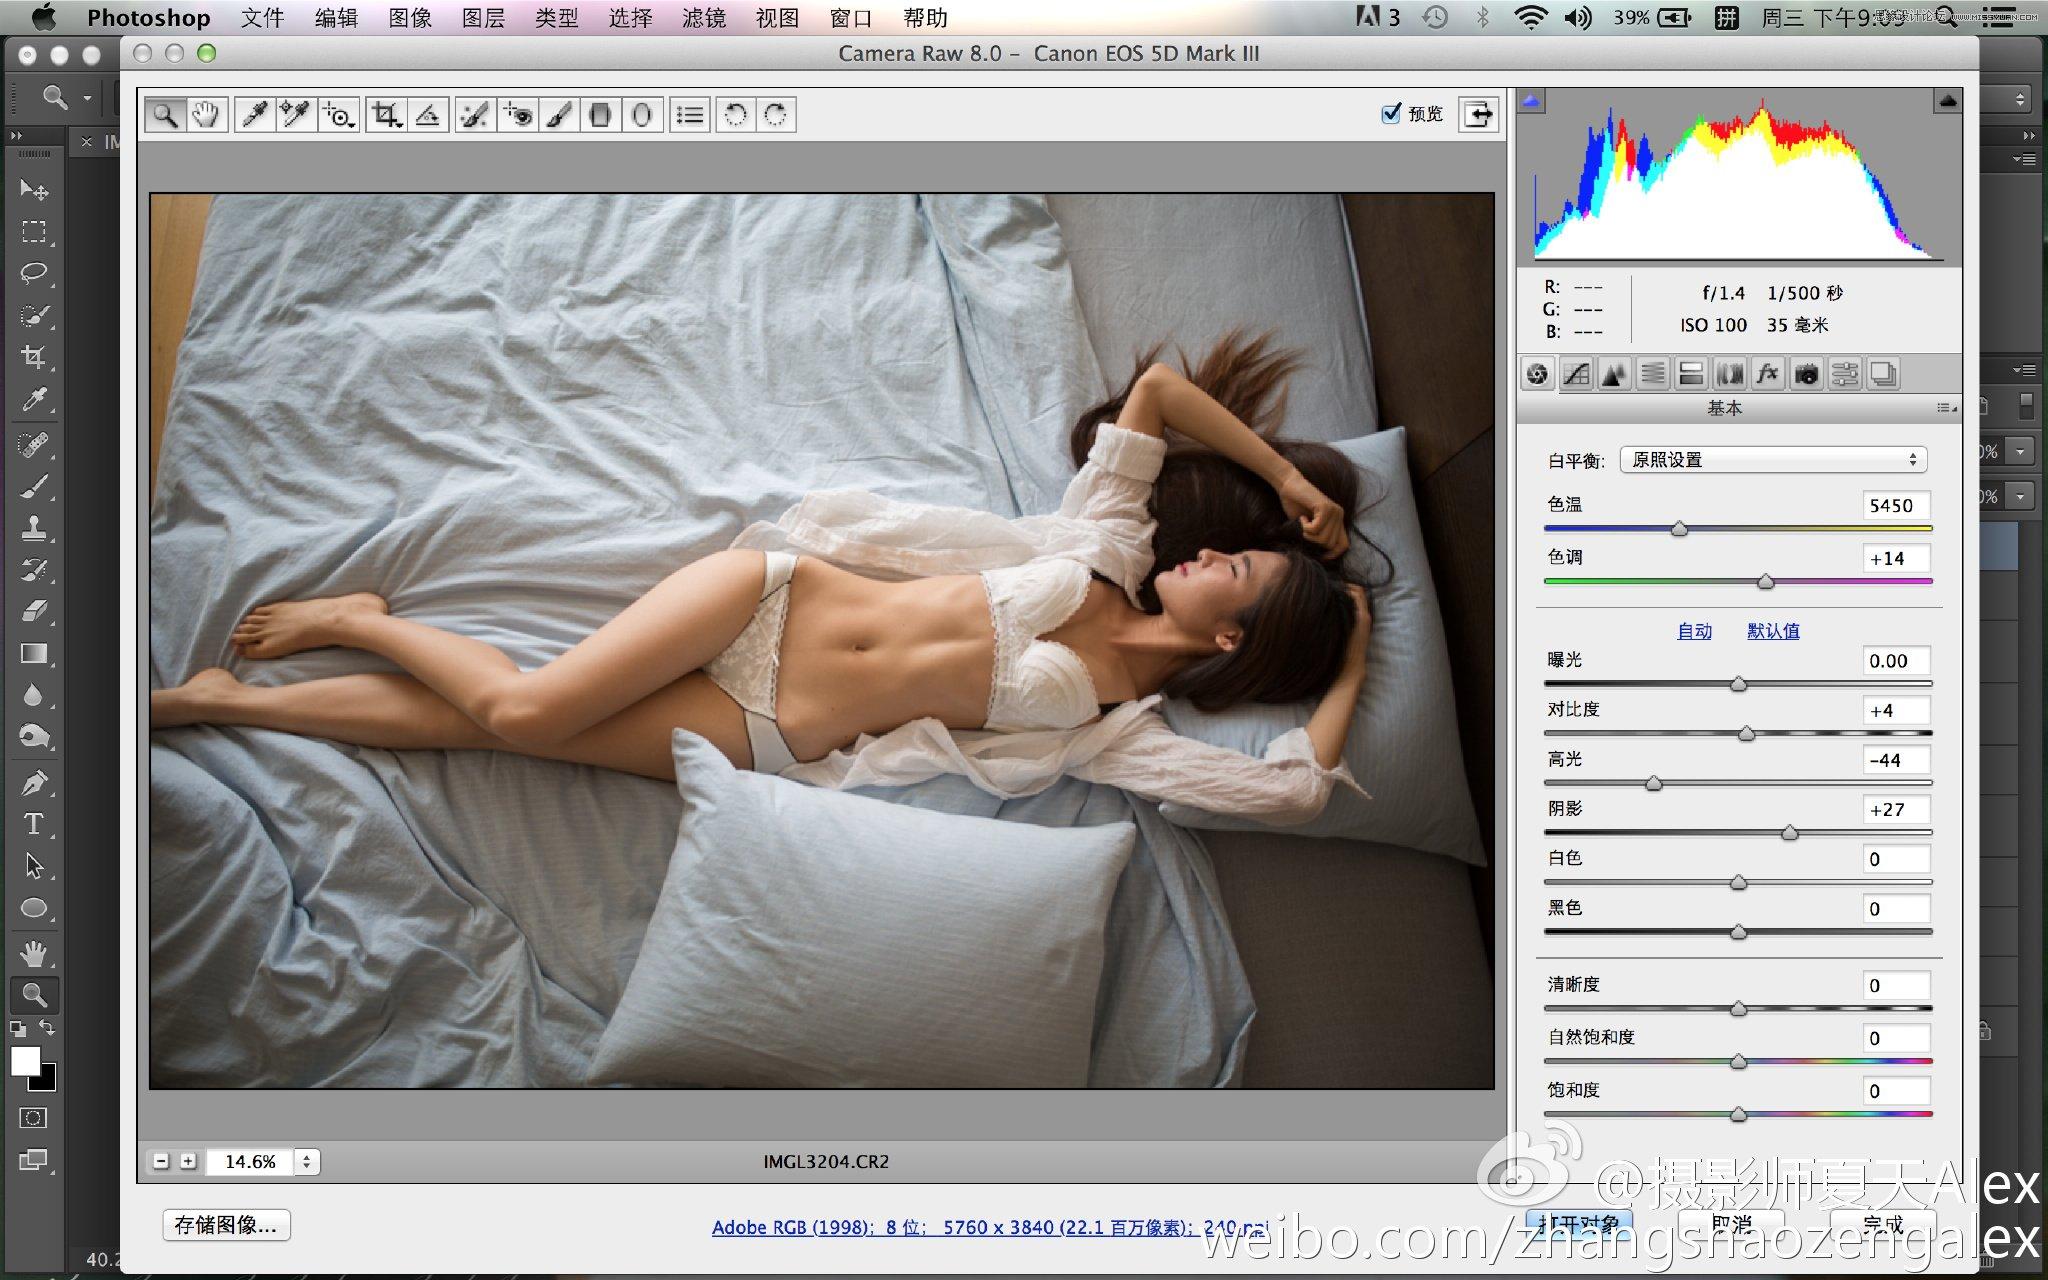 Photoshop调出电影胶片效果的室内人像照片